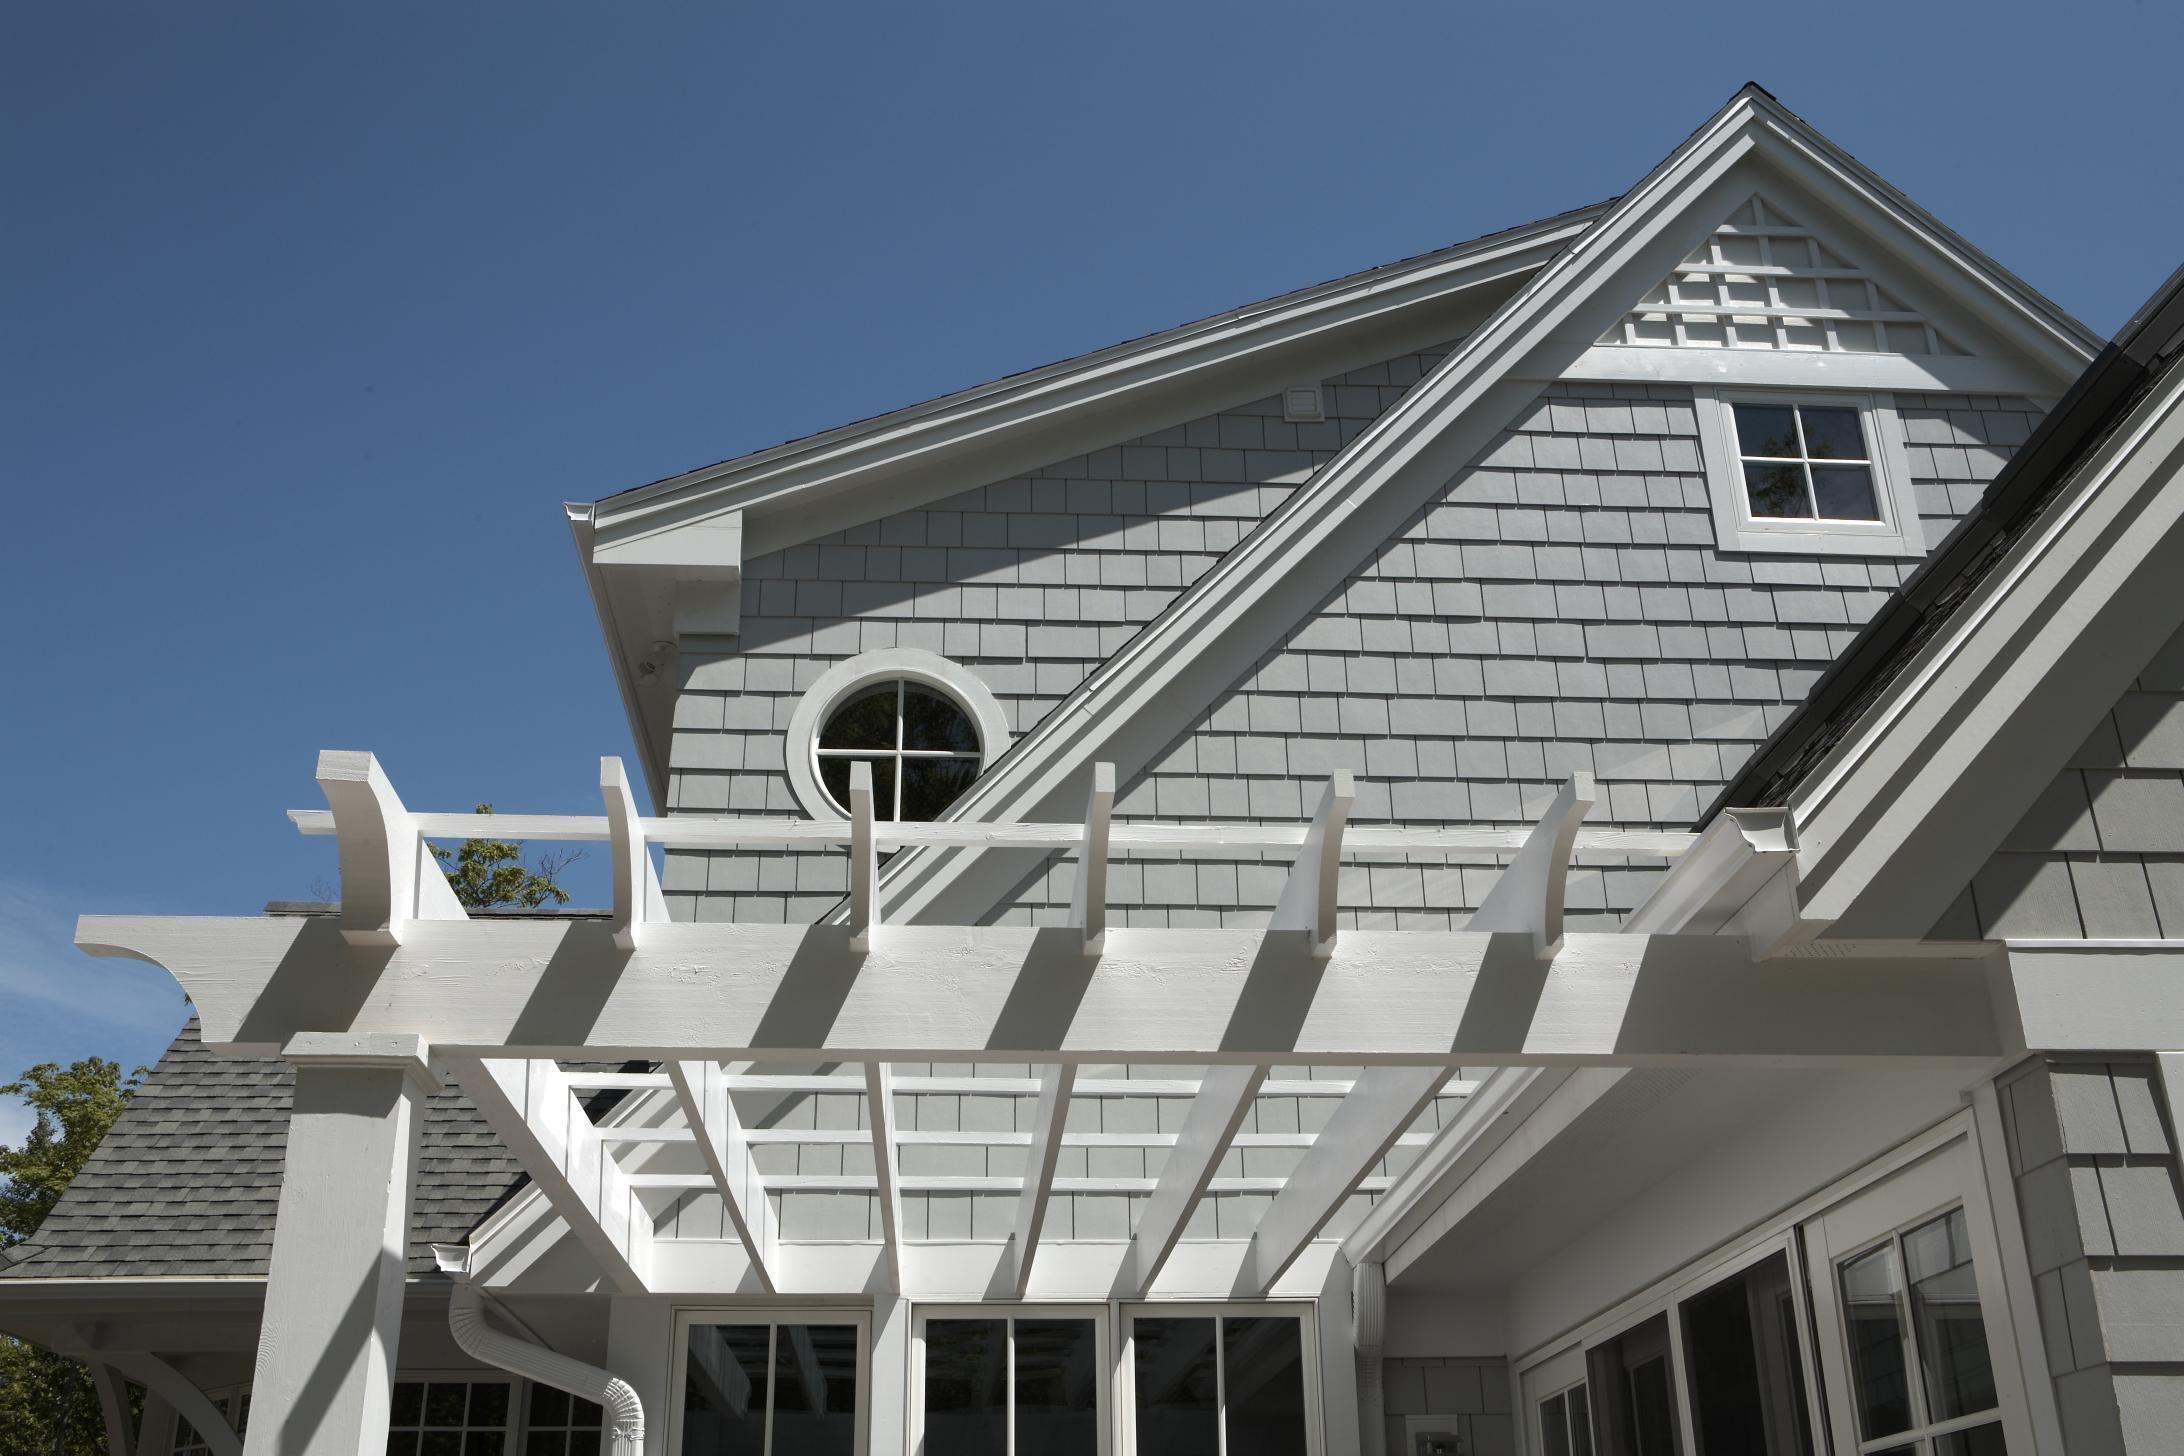 Best Light Mist Hardieshingle With Images Coastal Cottage 400 x 300